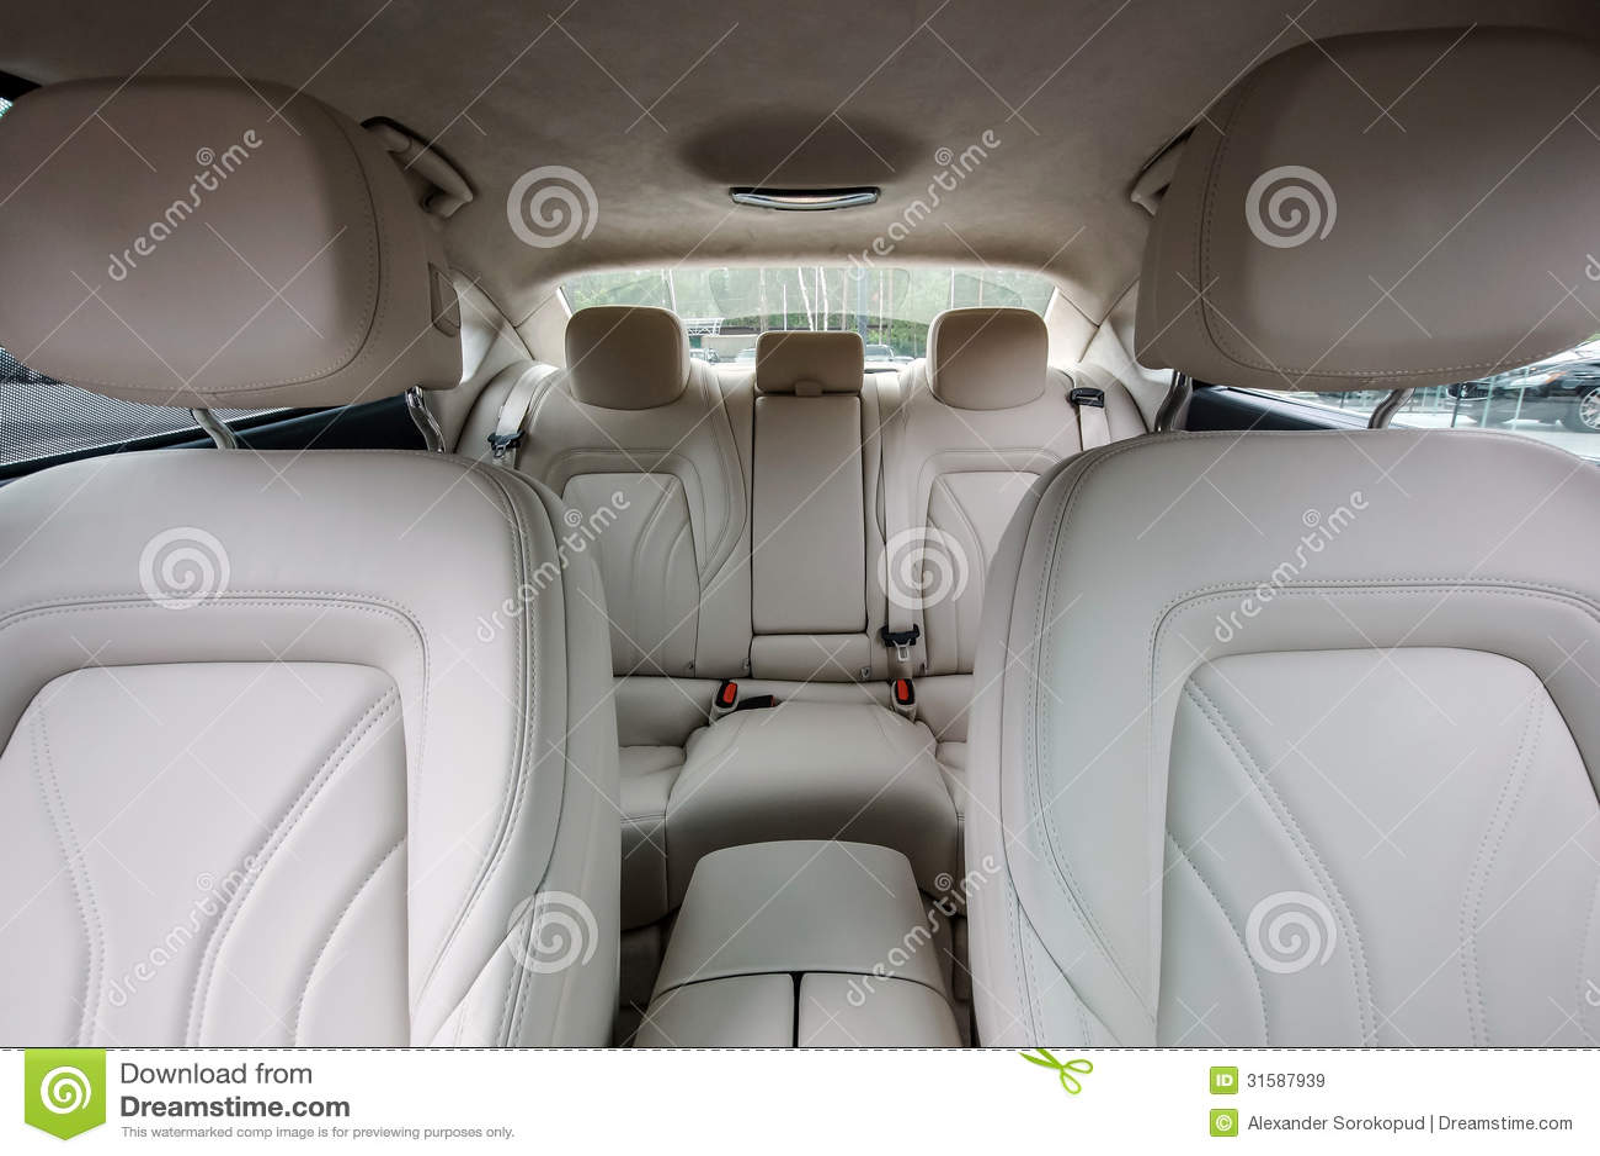 luxury car interior royalty free stock images image 31587939. Black Bedroom Furniture Sets. Home Design Ideas